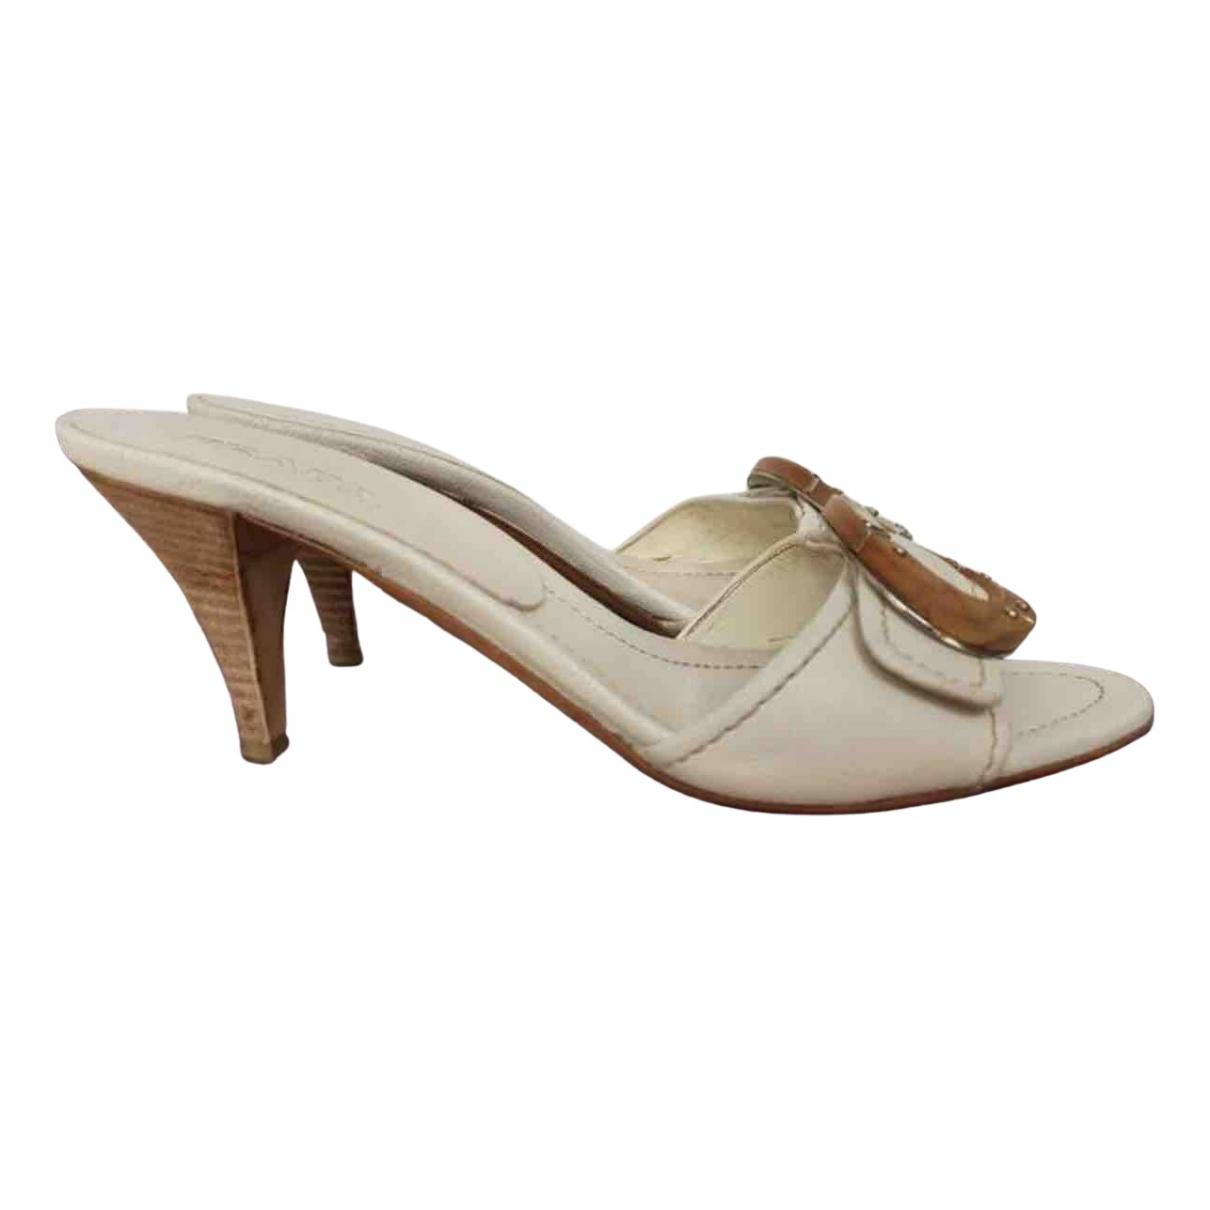 Prada - Sandales   pour femme - beige